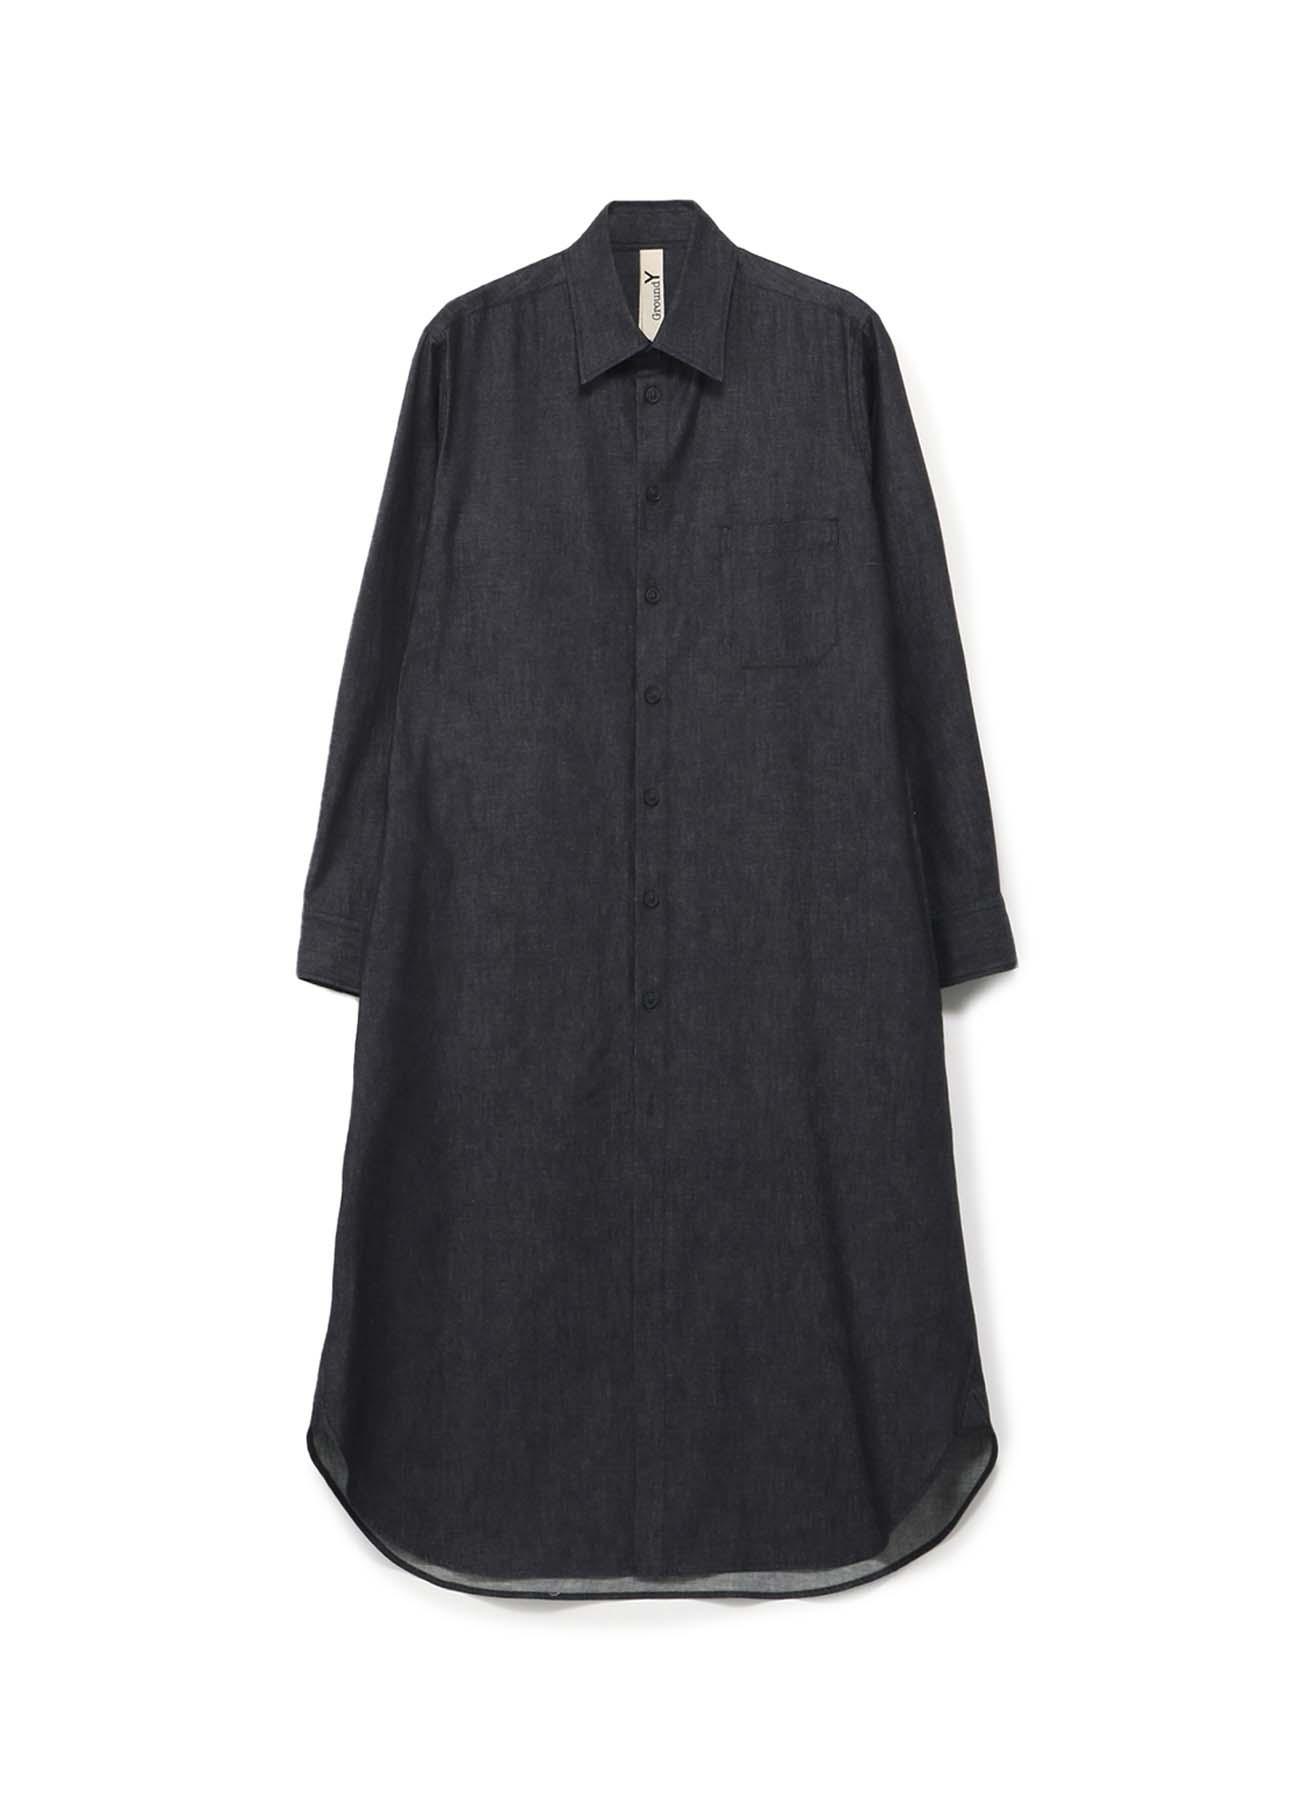 6oz Denim Long Shirt Dress